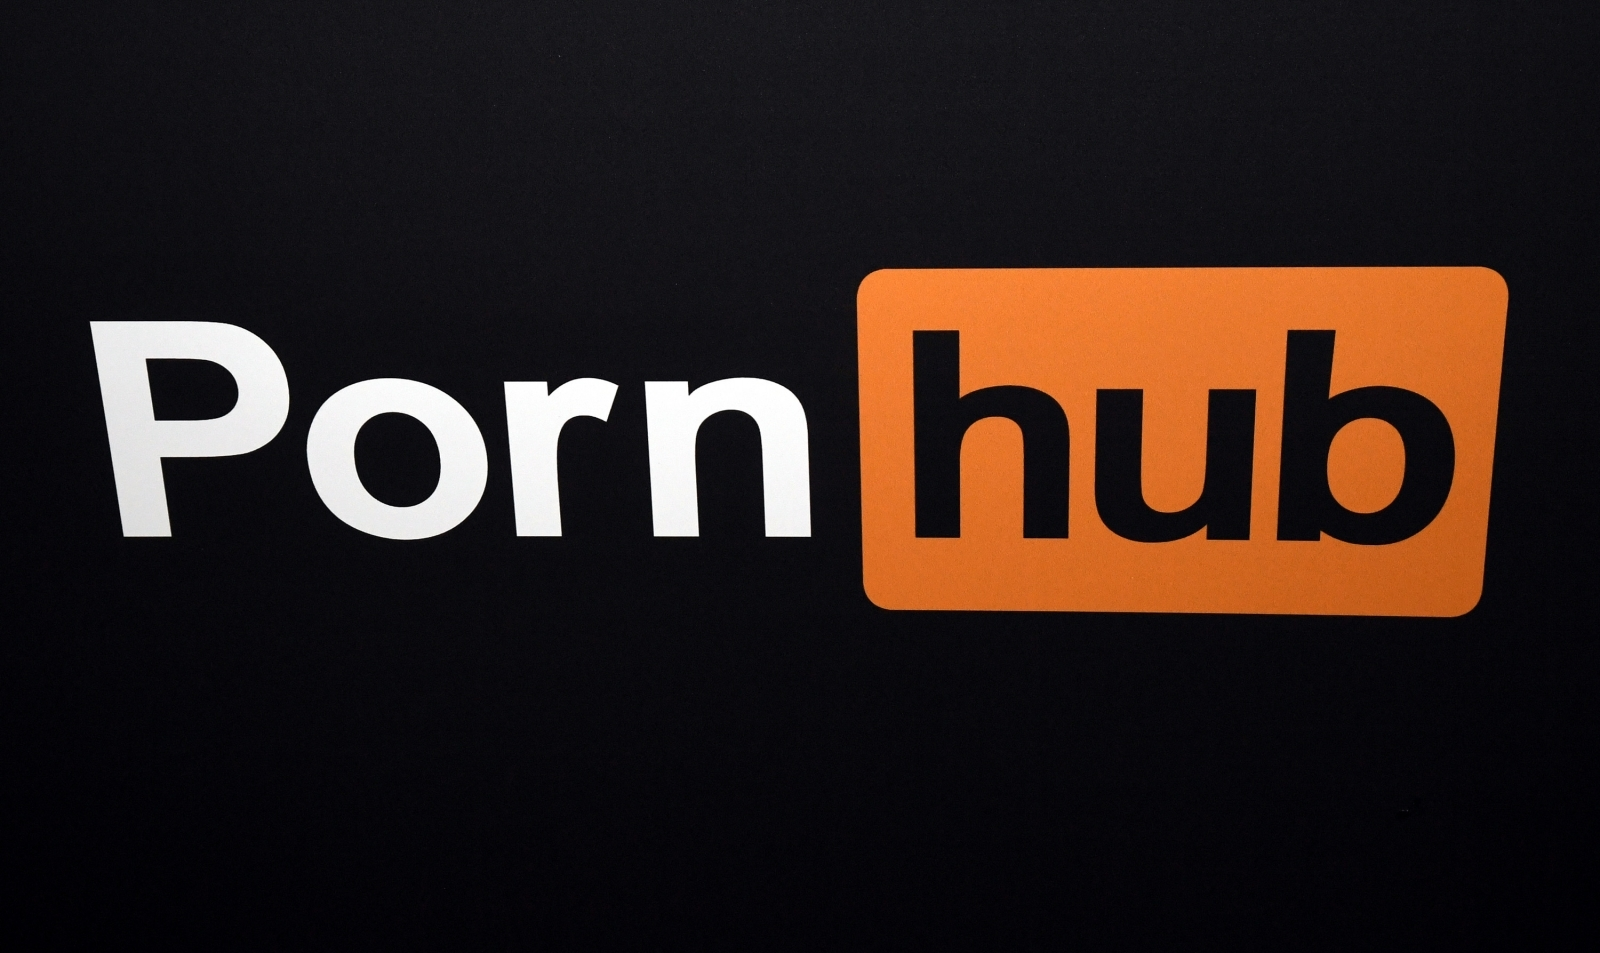 pornhub full